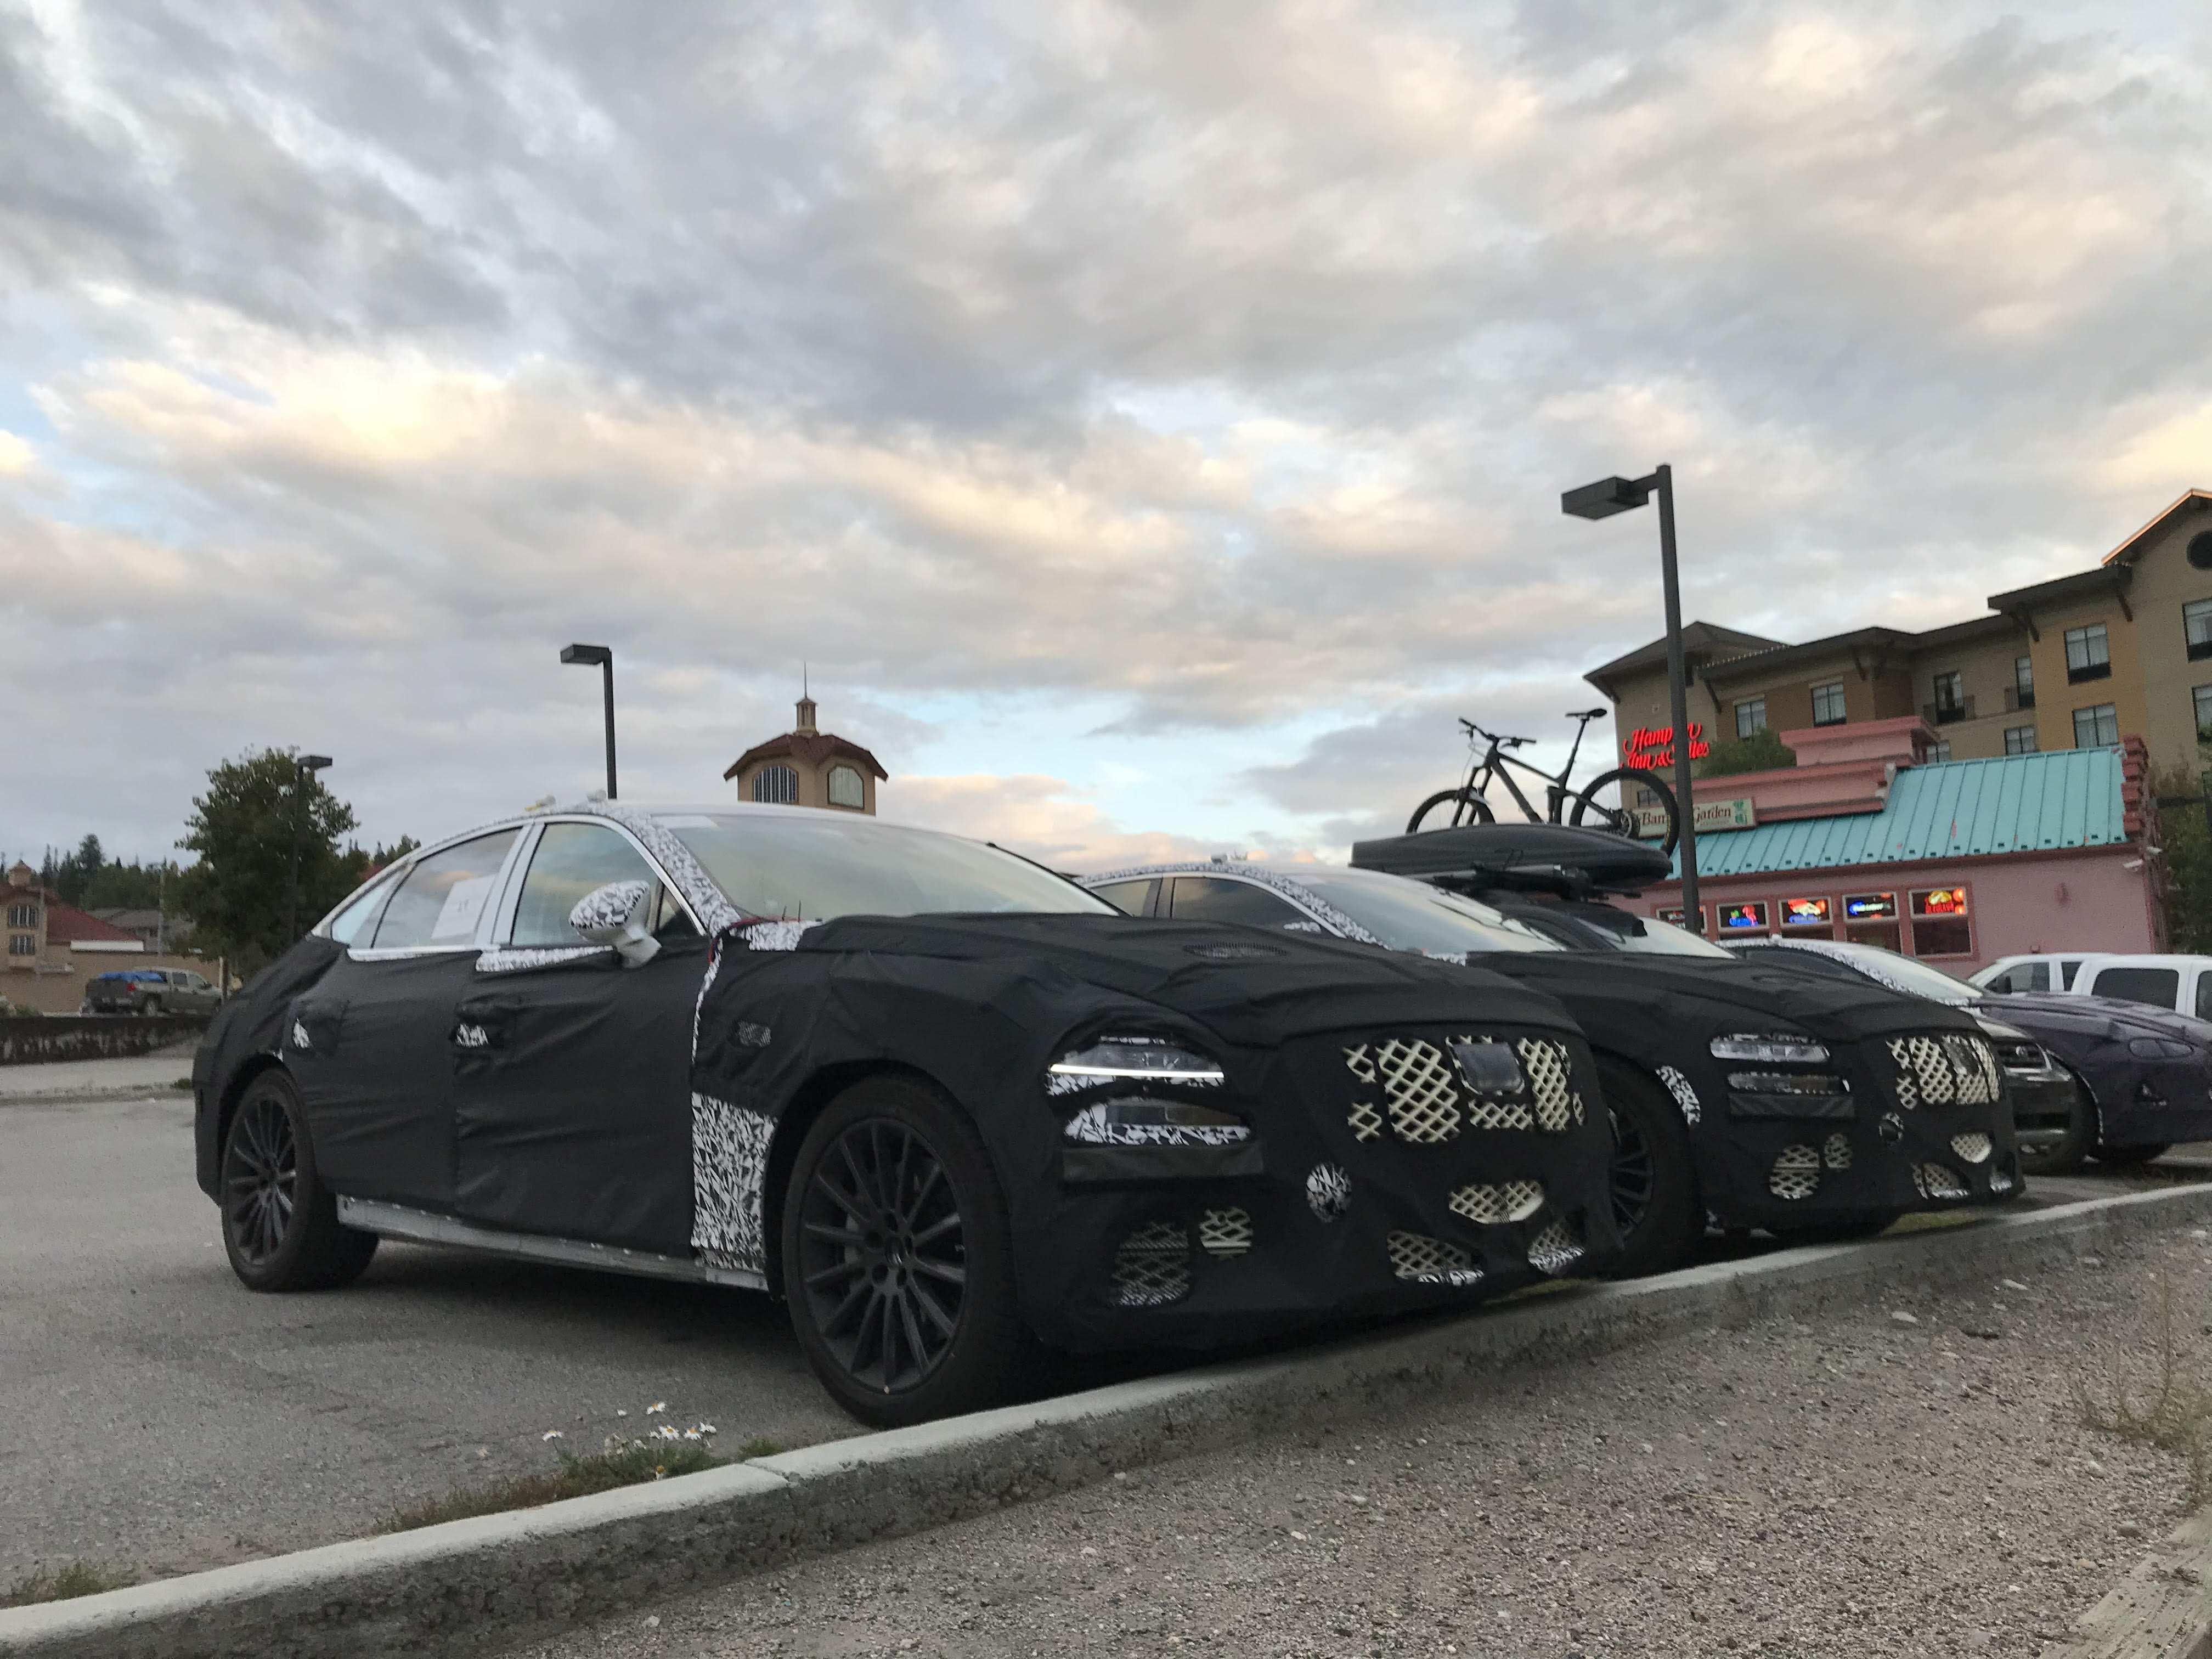 45 New 2020 Spy Shots Lincoln Mkz Sedan History for 2020 Spy Shots Lincoln Mkz Sedan